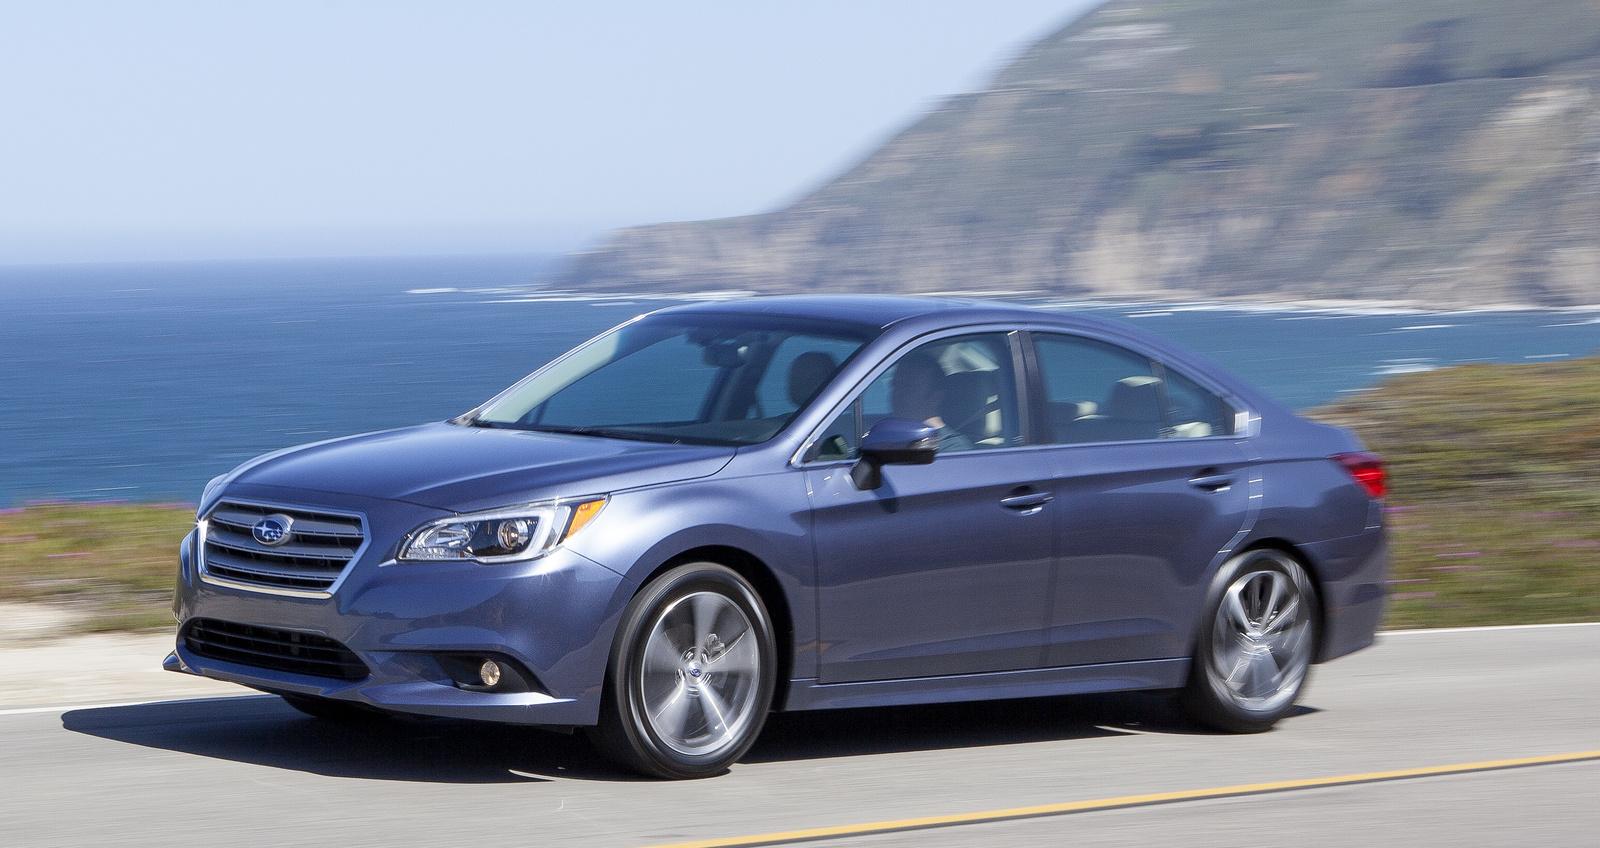 2016 Subaru Legacy - Review - CarGurus